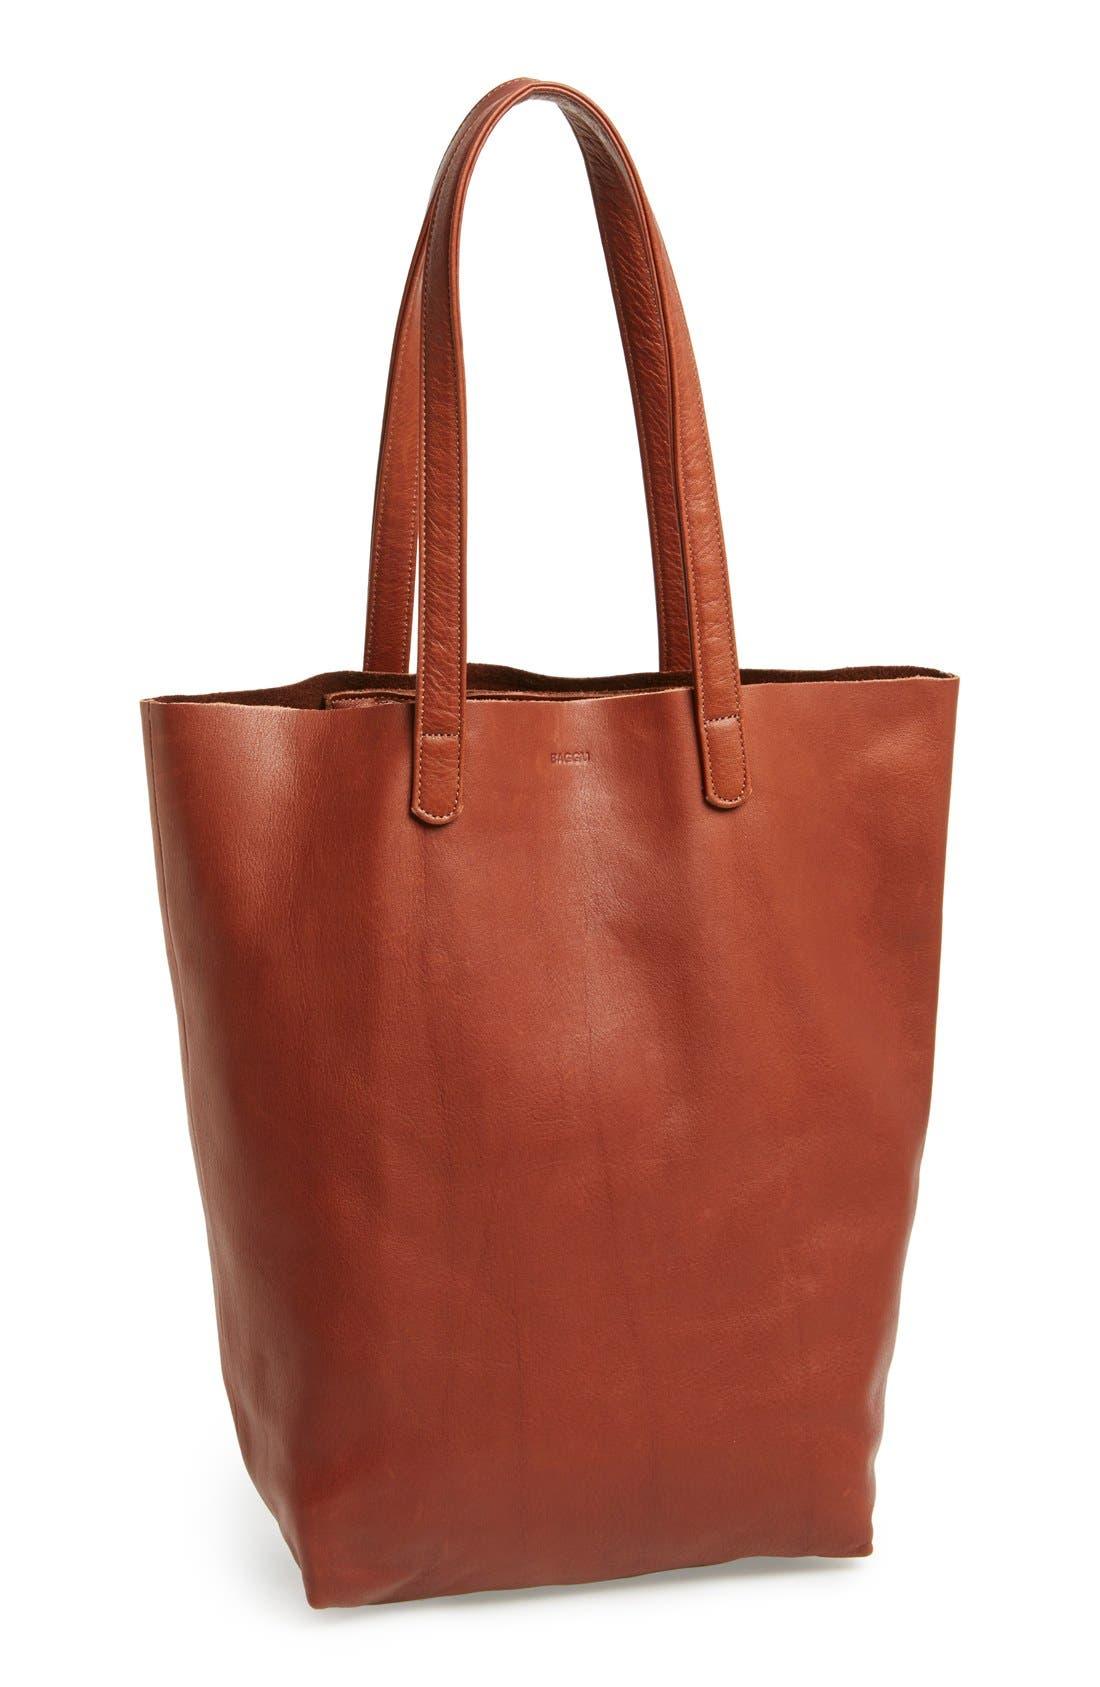 Main Image - Baggu® 'Basic' Leather Tote